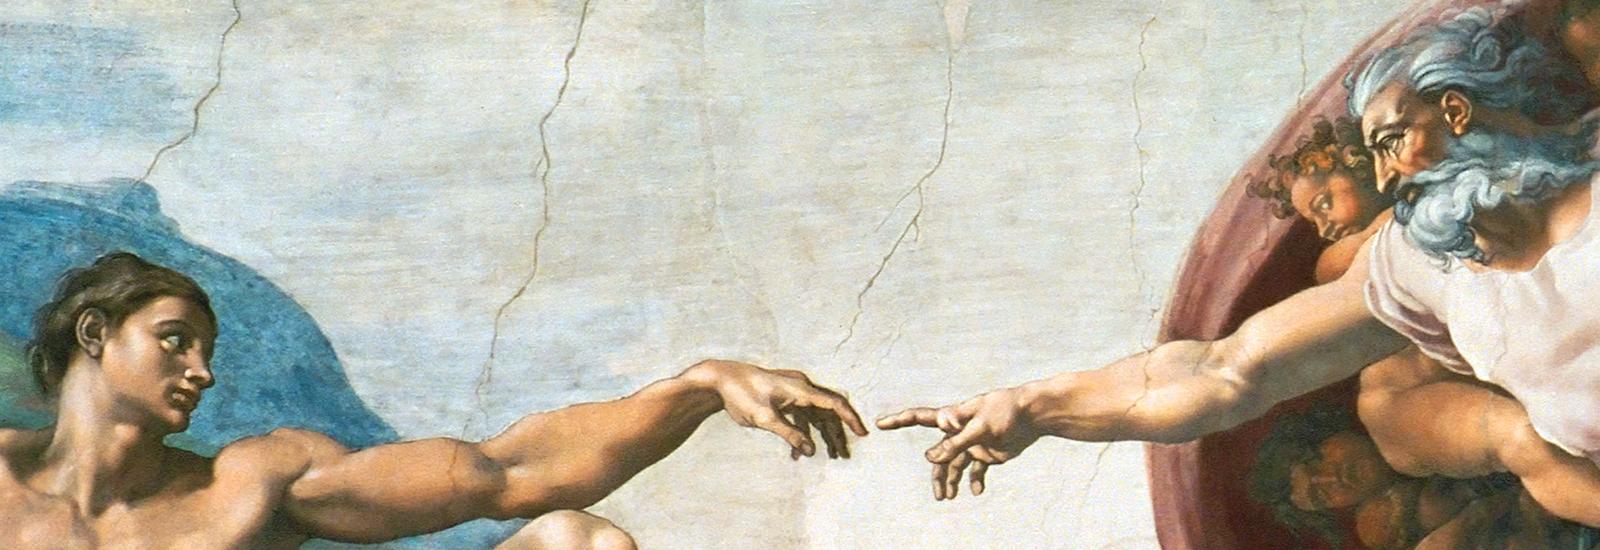 Michelangelo's Sistine Chapel: A Different View ...